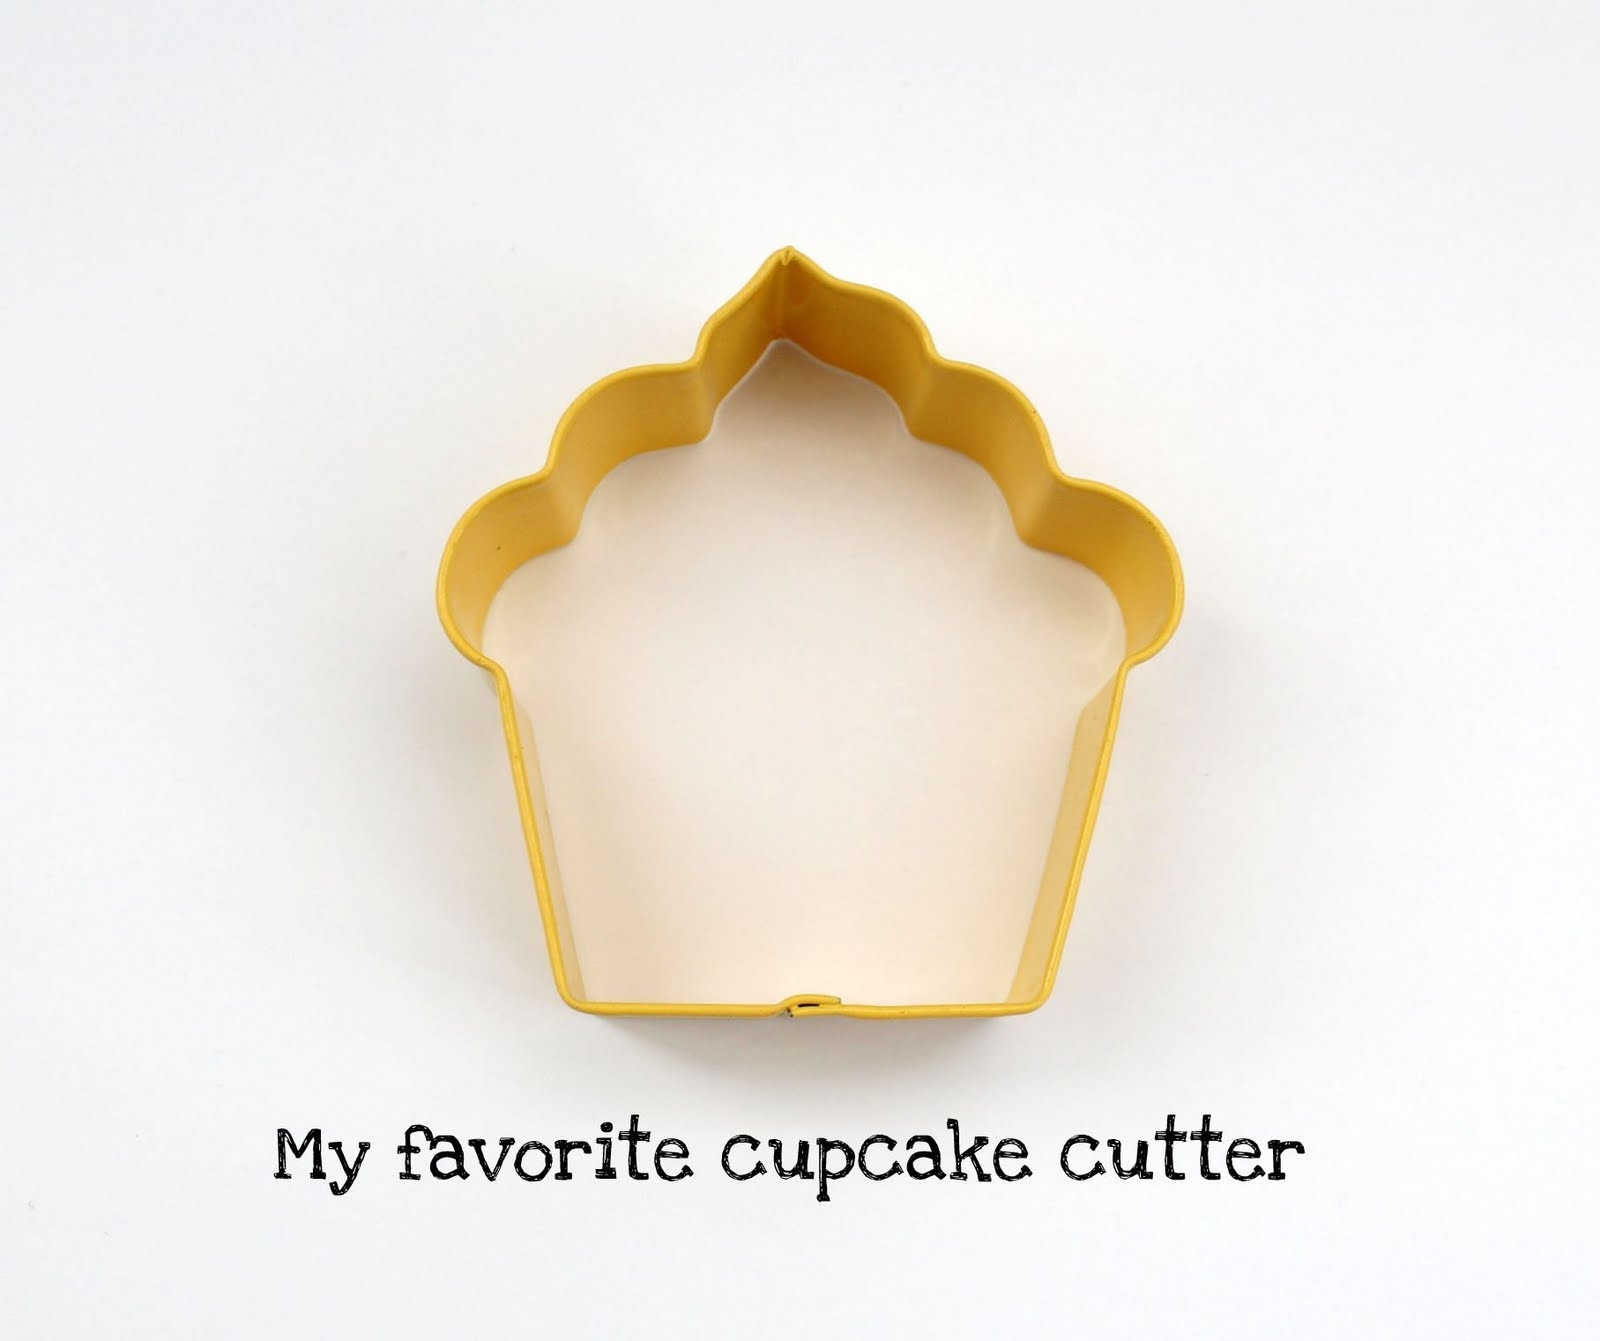 A cupcake-shaped cookie cutter